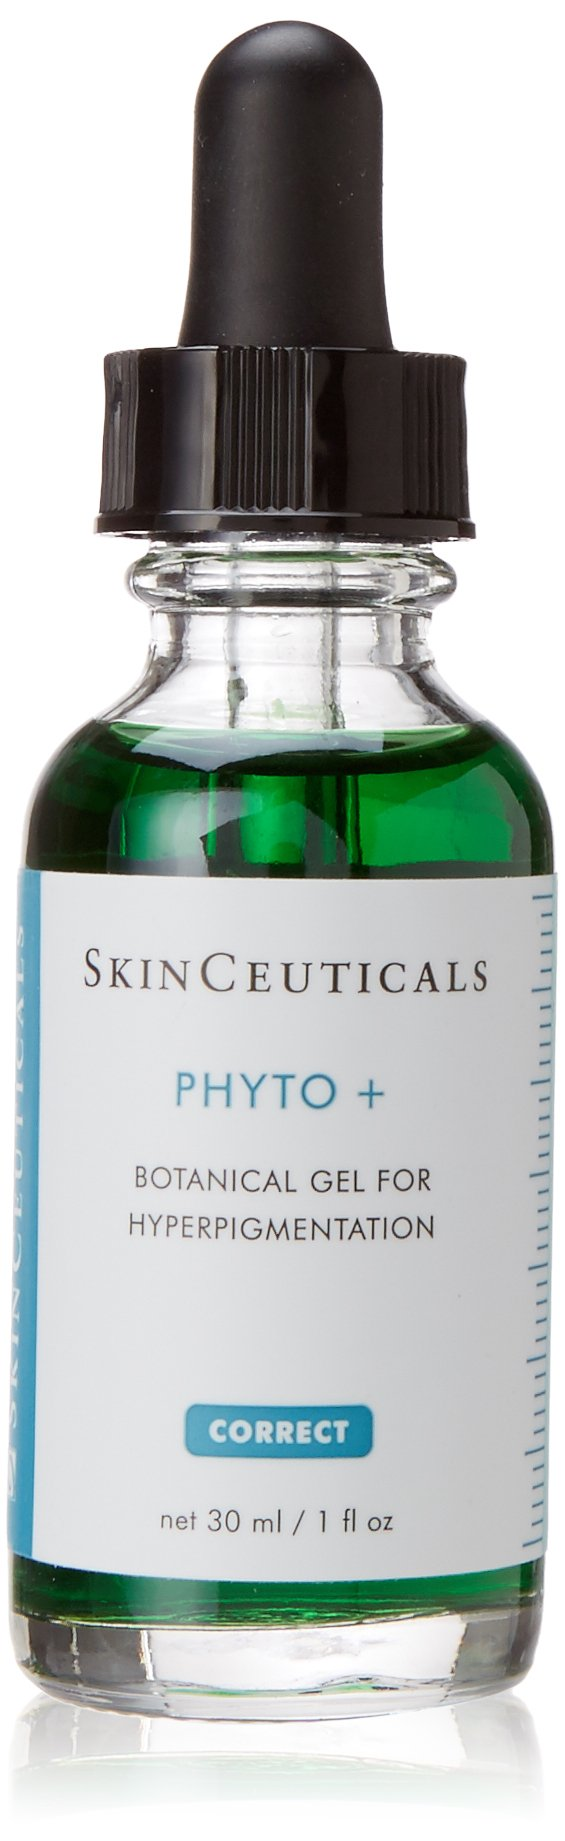 SkinCeuticals Phyto + (Hydrating botanical serum to reduce hyperpigmentation) - 1 oz